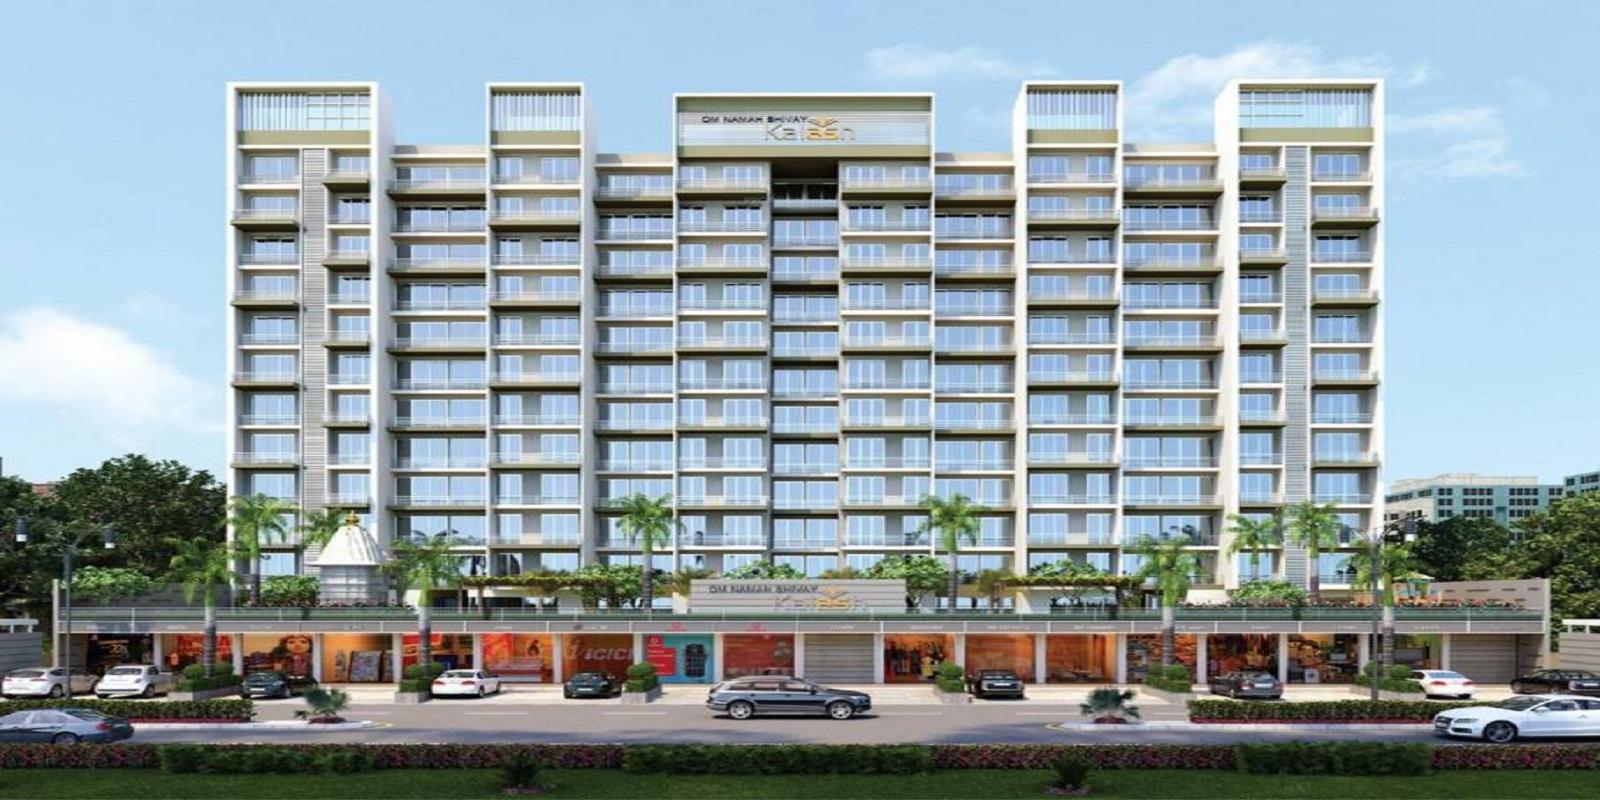 satpanth om namah shivay kalash project project large image1